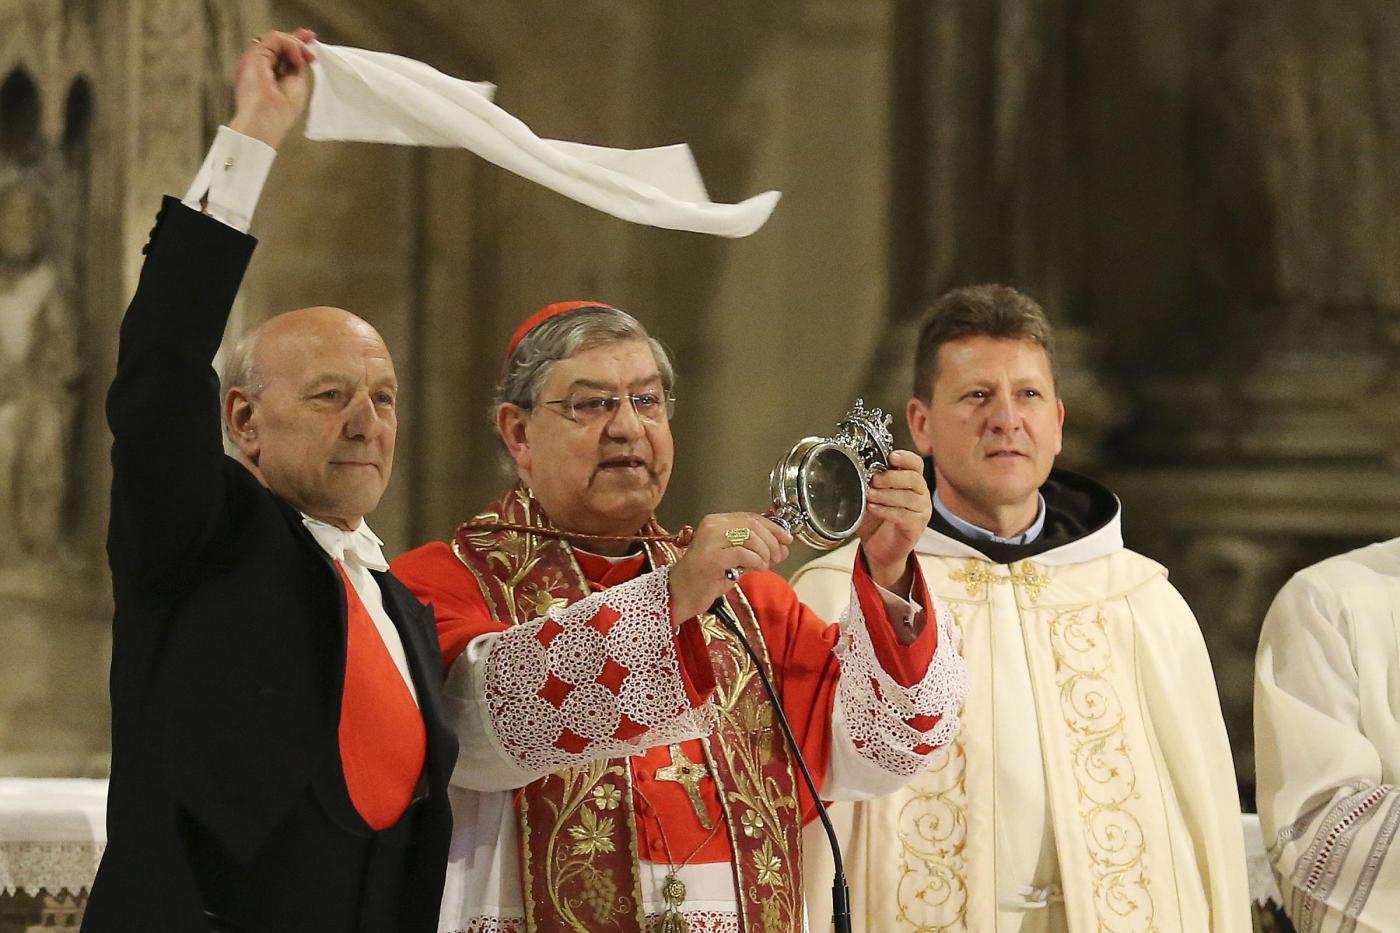 Miracolo del sangue di San Gennaro: cosa dice la scienza